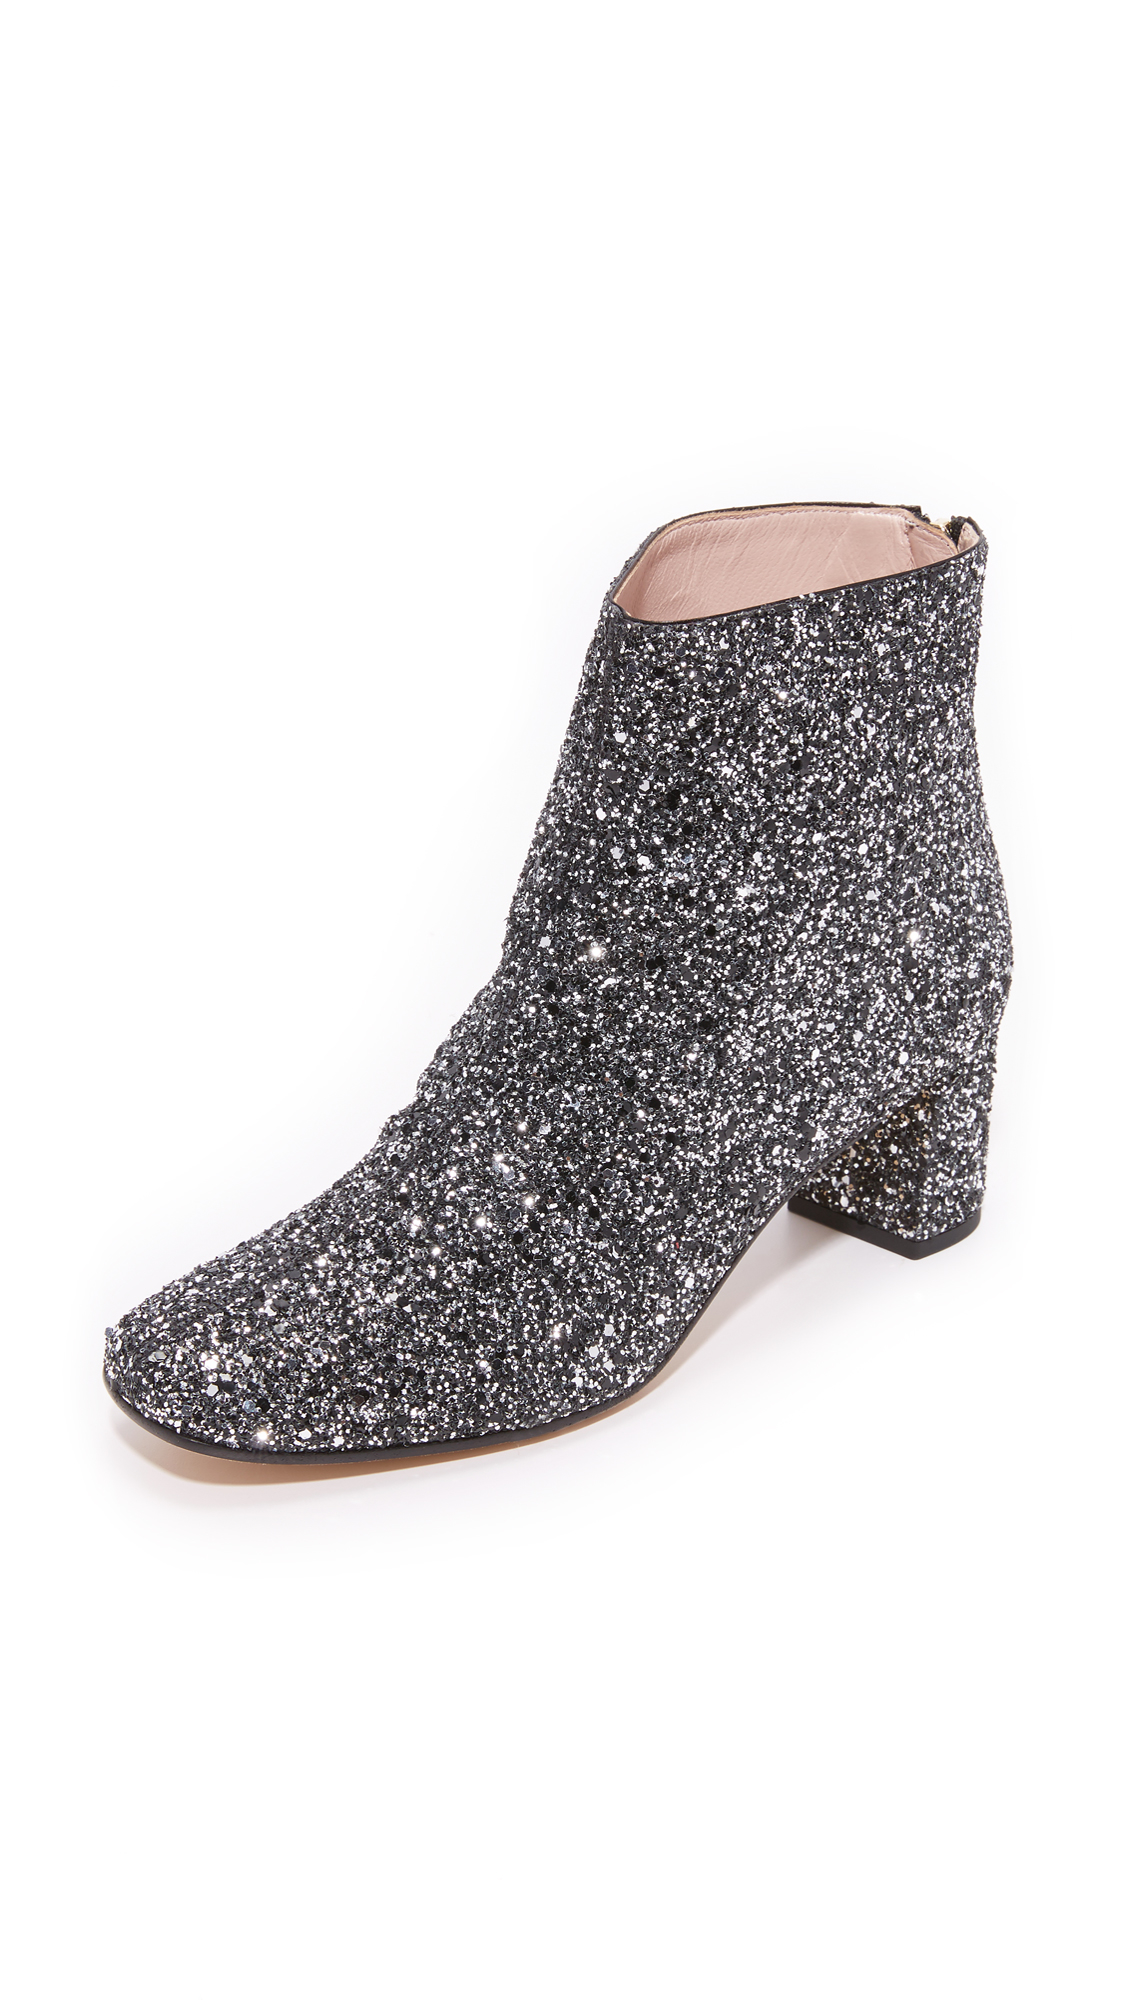 Lyst Kate Spade New York Tal Glitter Booties